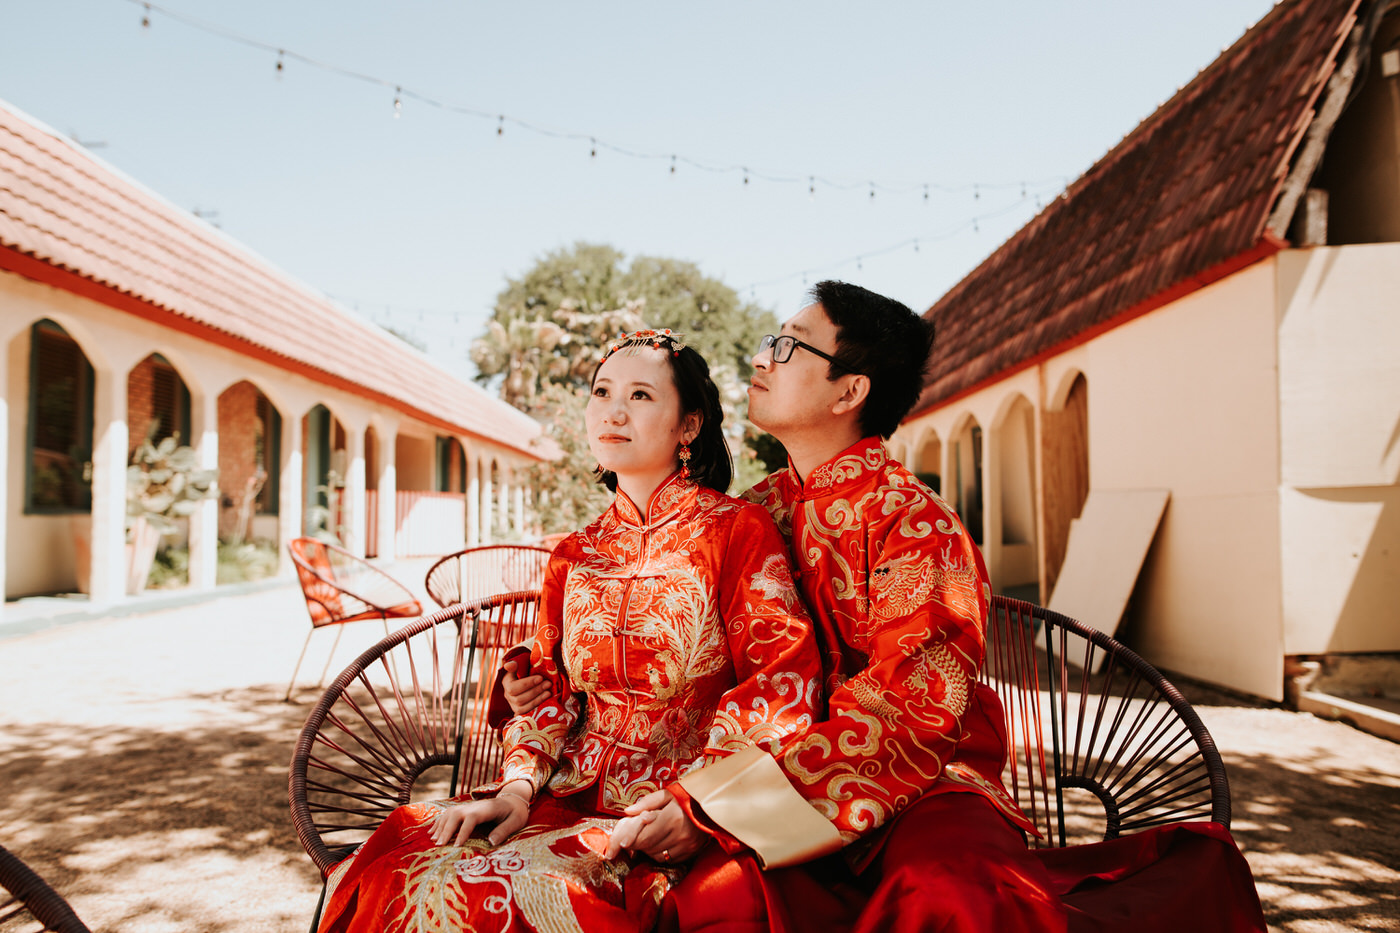 South Congress Austin Wedding - Diana Ascarrrunz Photography -342.jpg